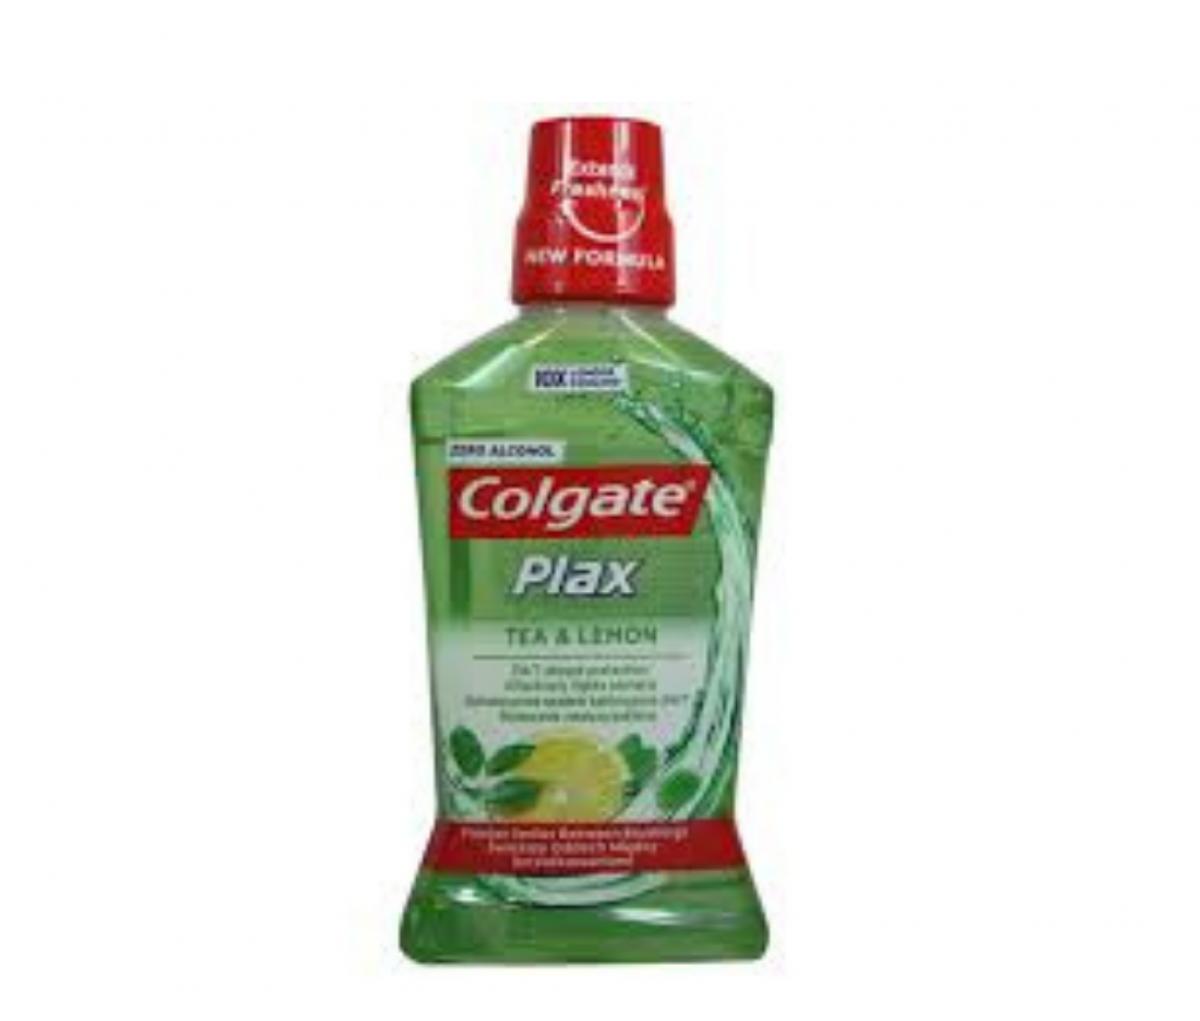 Colgate 500ml Plax Tea and Lemon Mouth Wash